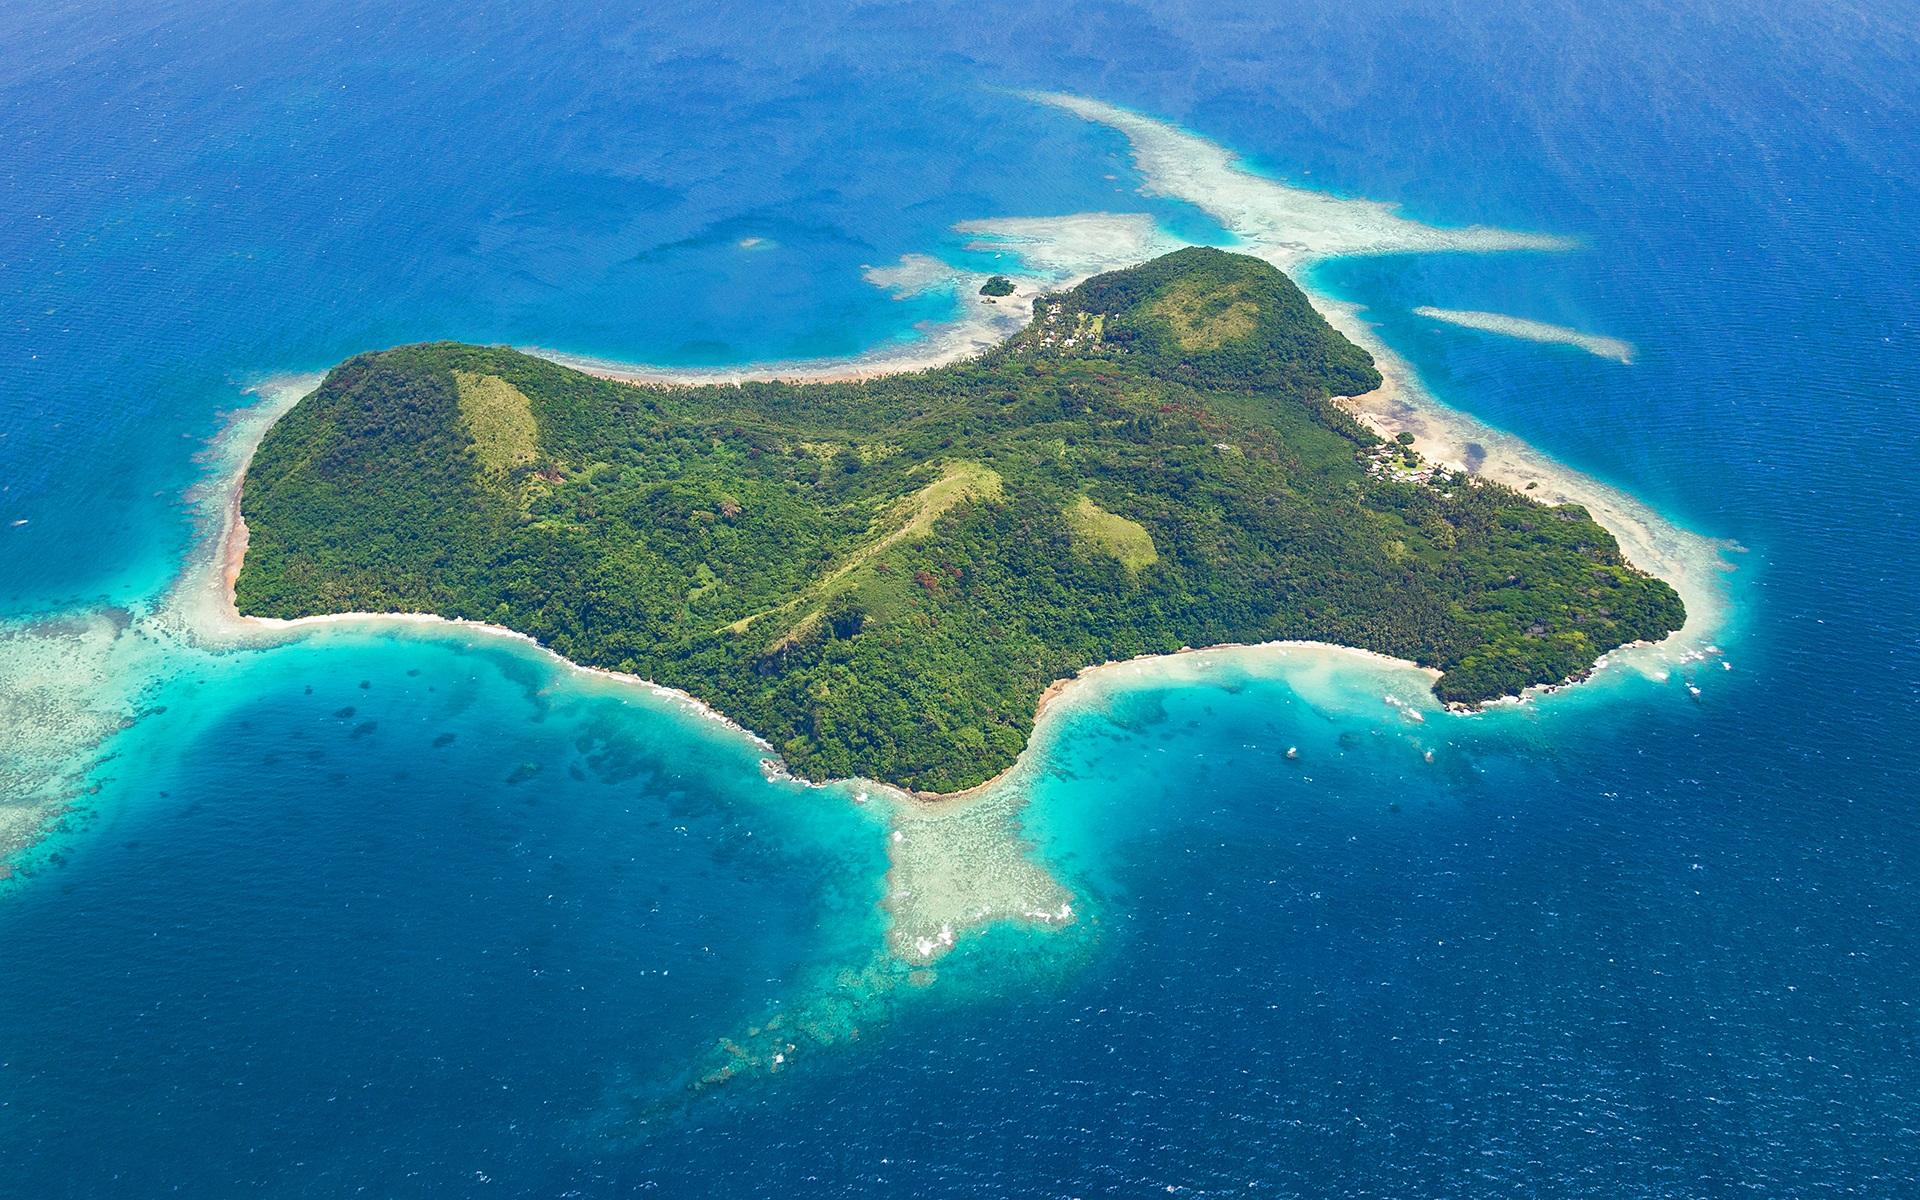 Wallpaper Wakaya Island Fiji Sea Top View 1920x1200 HD Picture Image